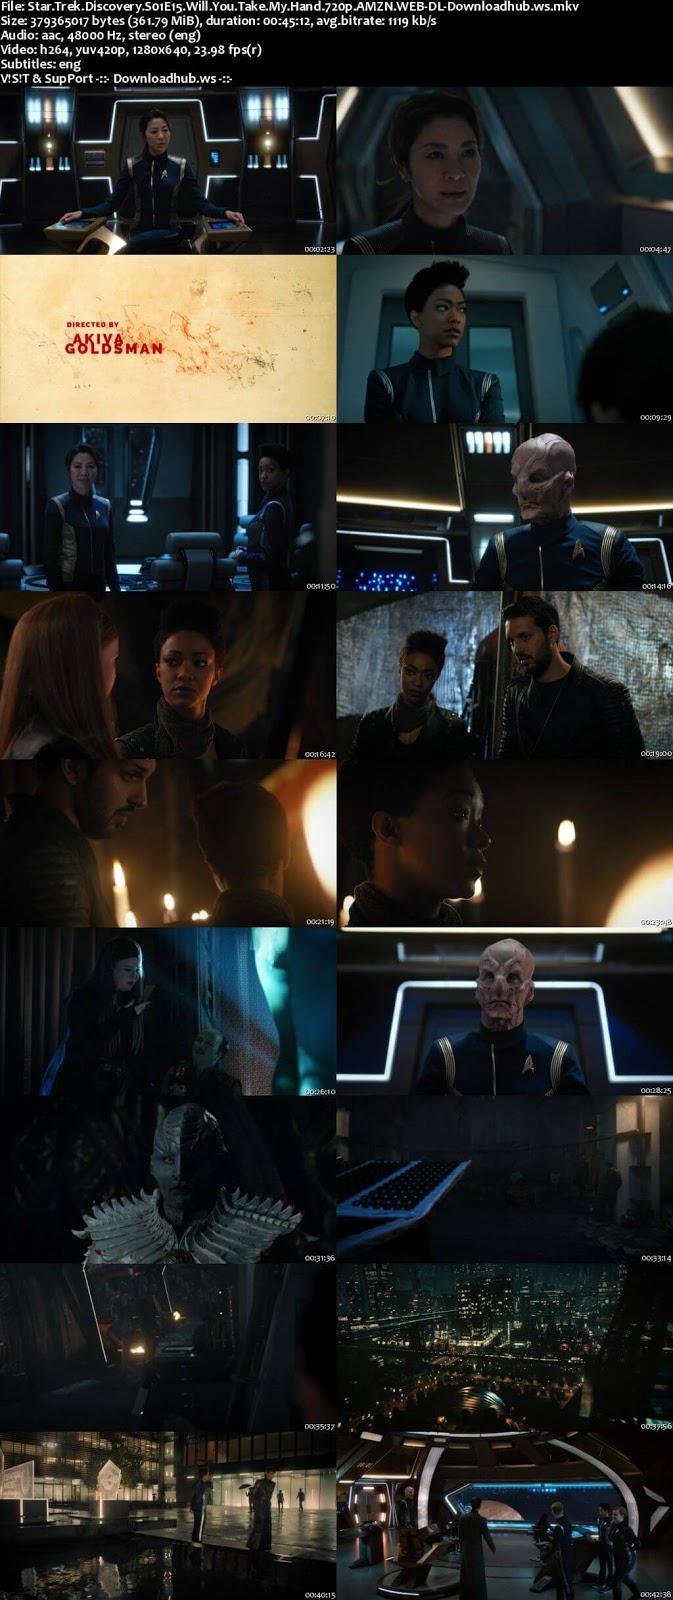 Star Trek: Discovery S01E15 350MB Web-DL 720p ESubs